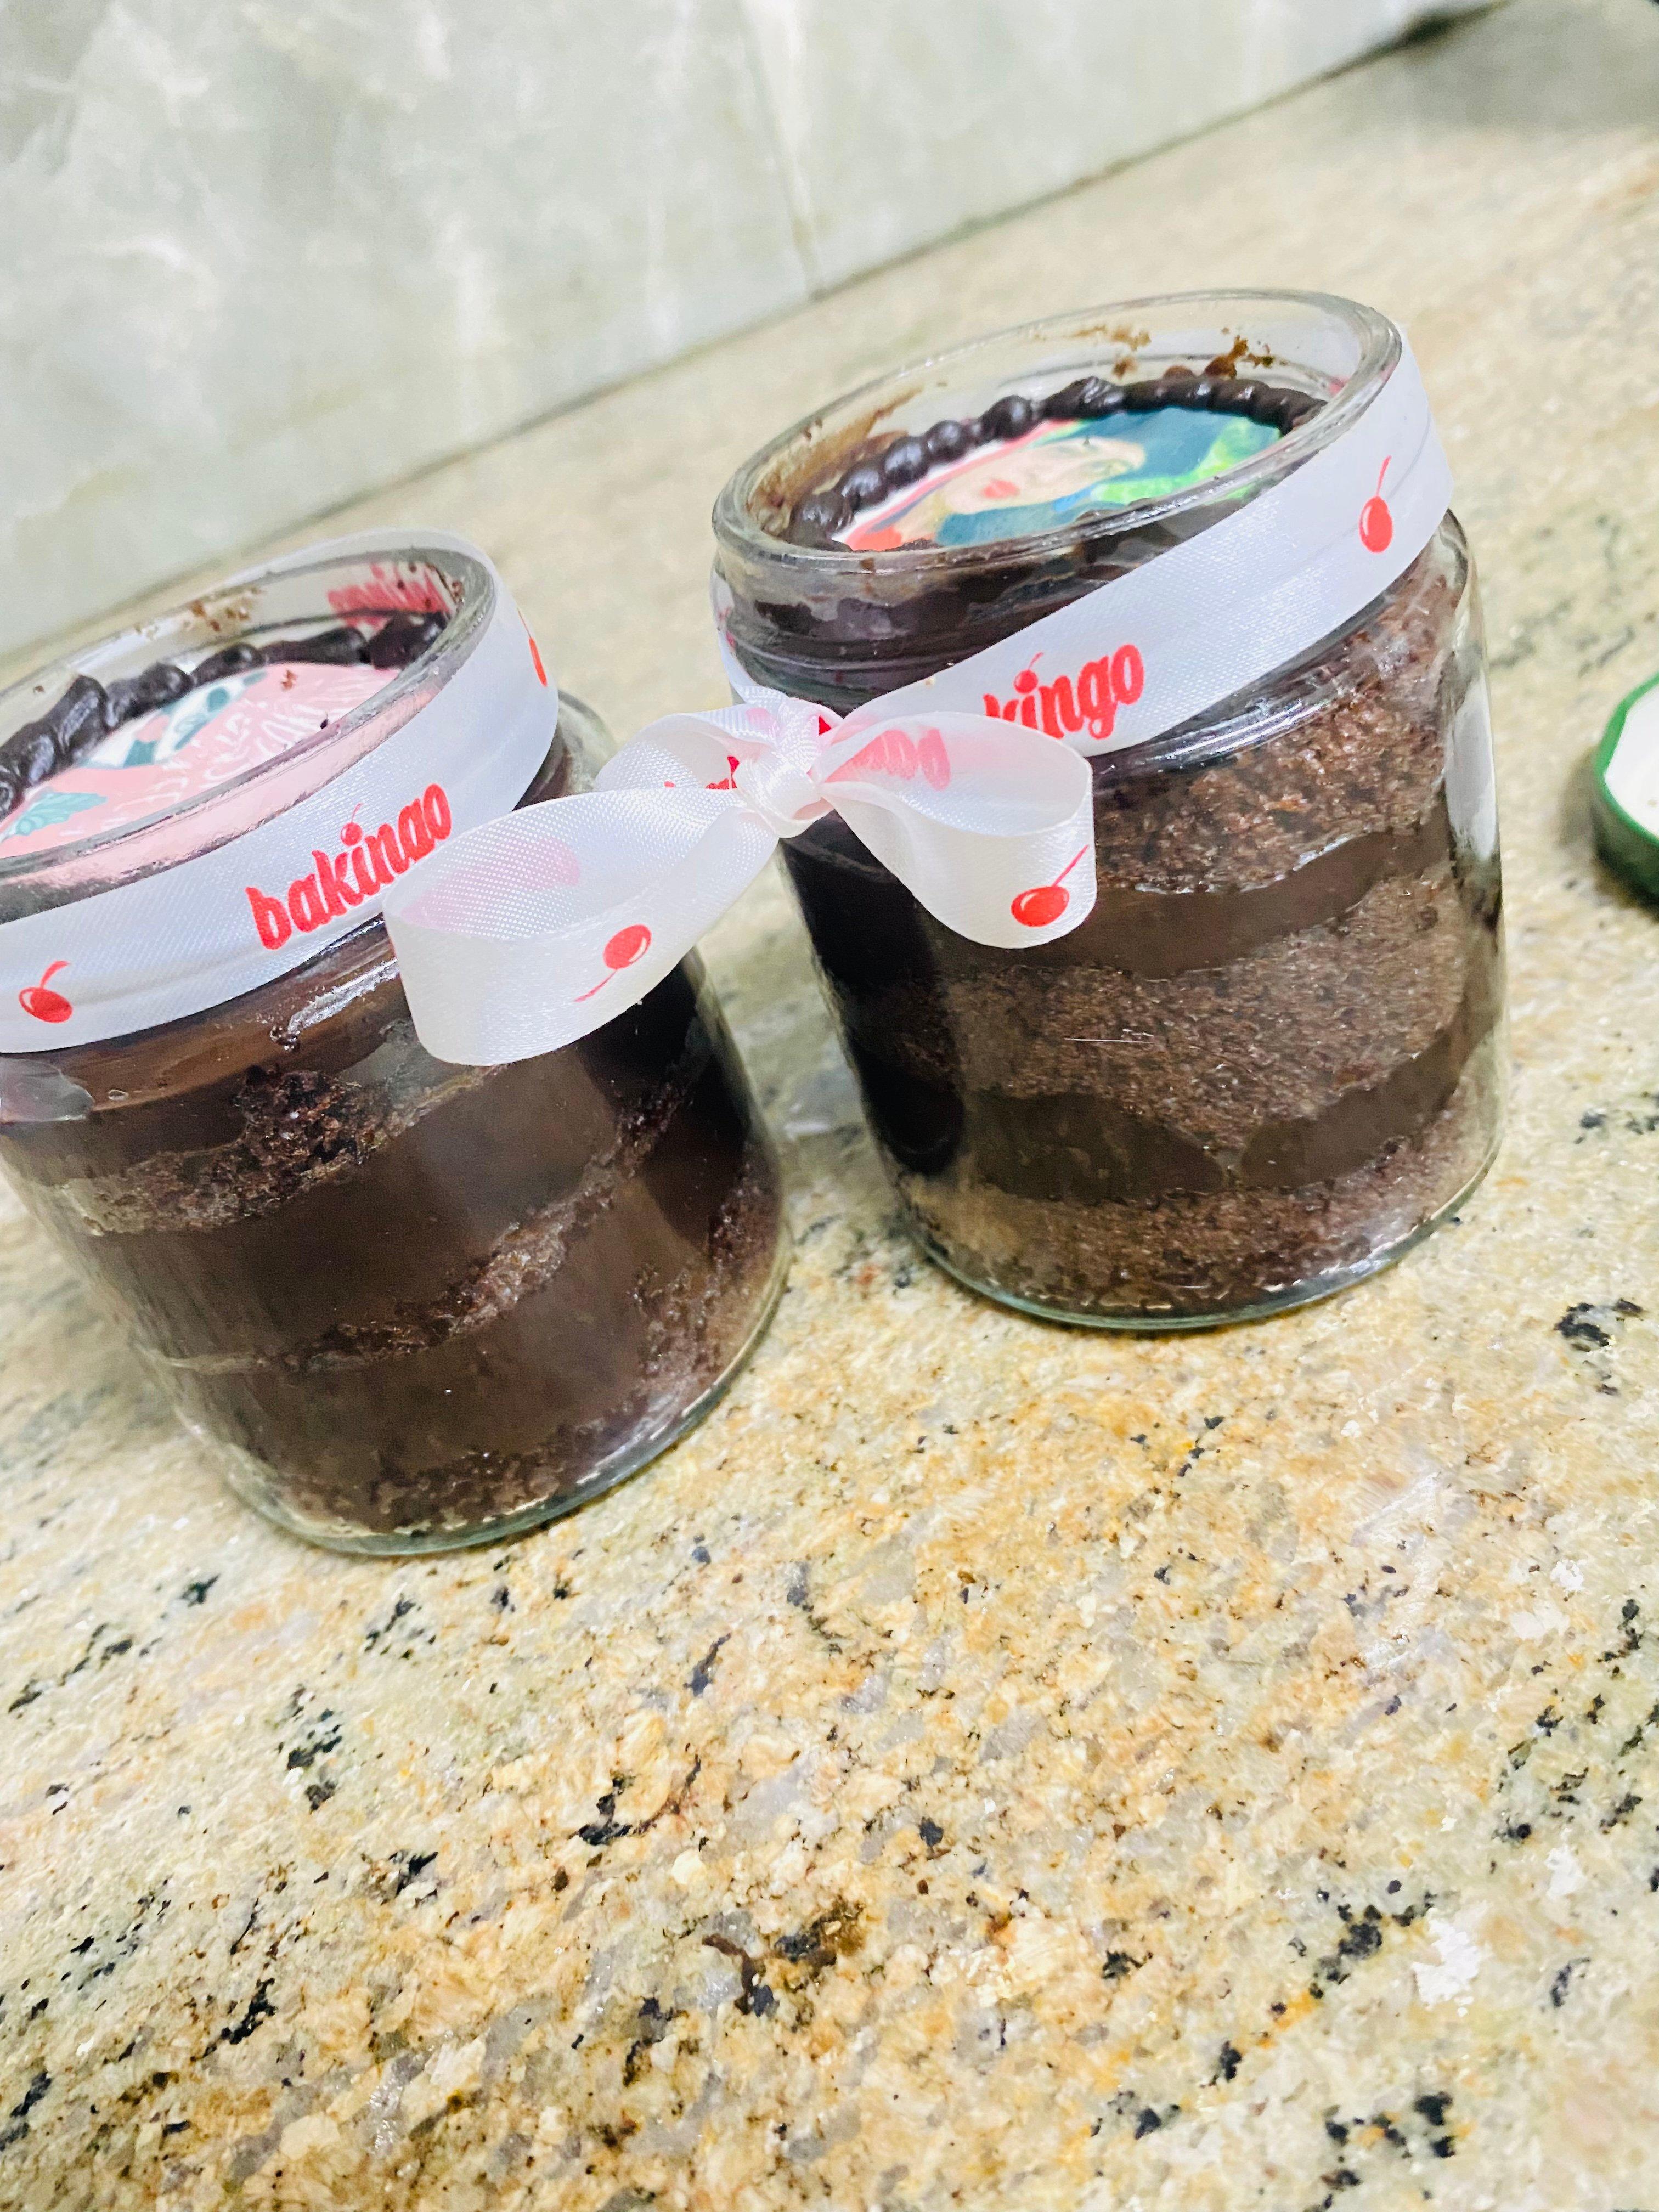 Friendship Day Personalized Chocolate Jar Cakes